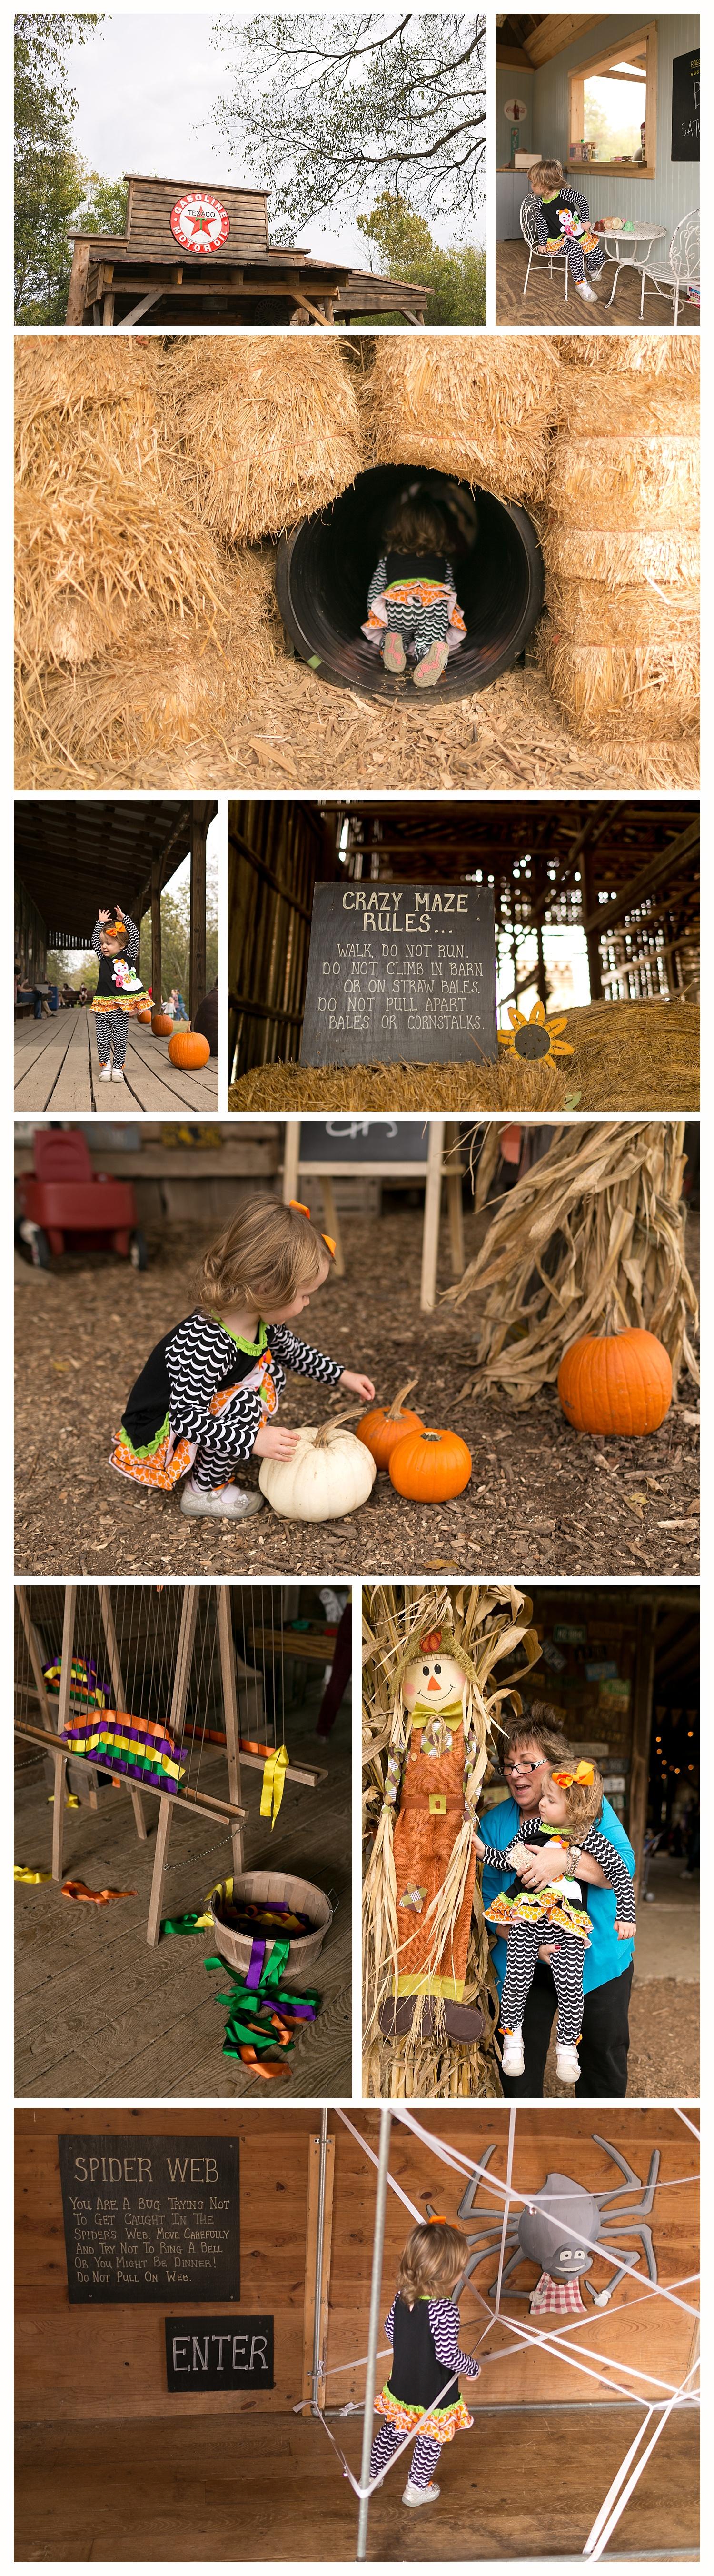 children's activities at Gentry's Farm in Franklin, TN